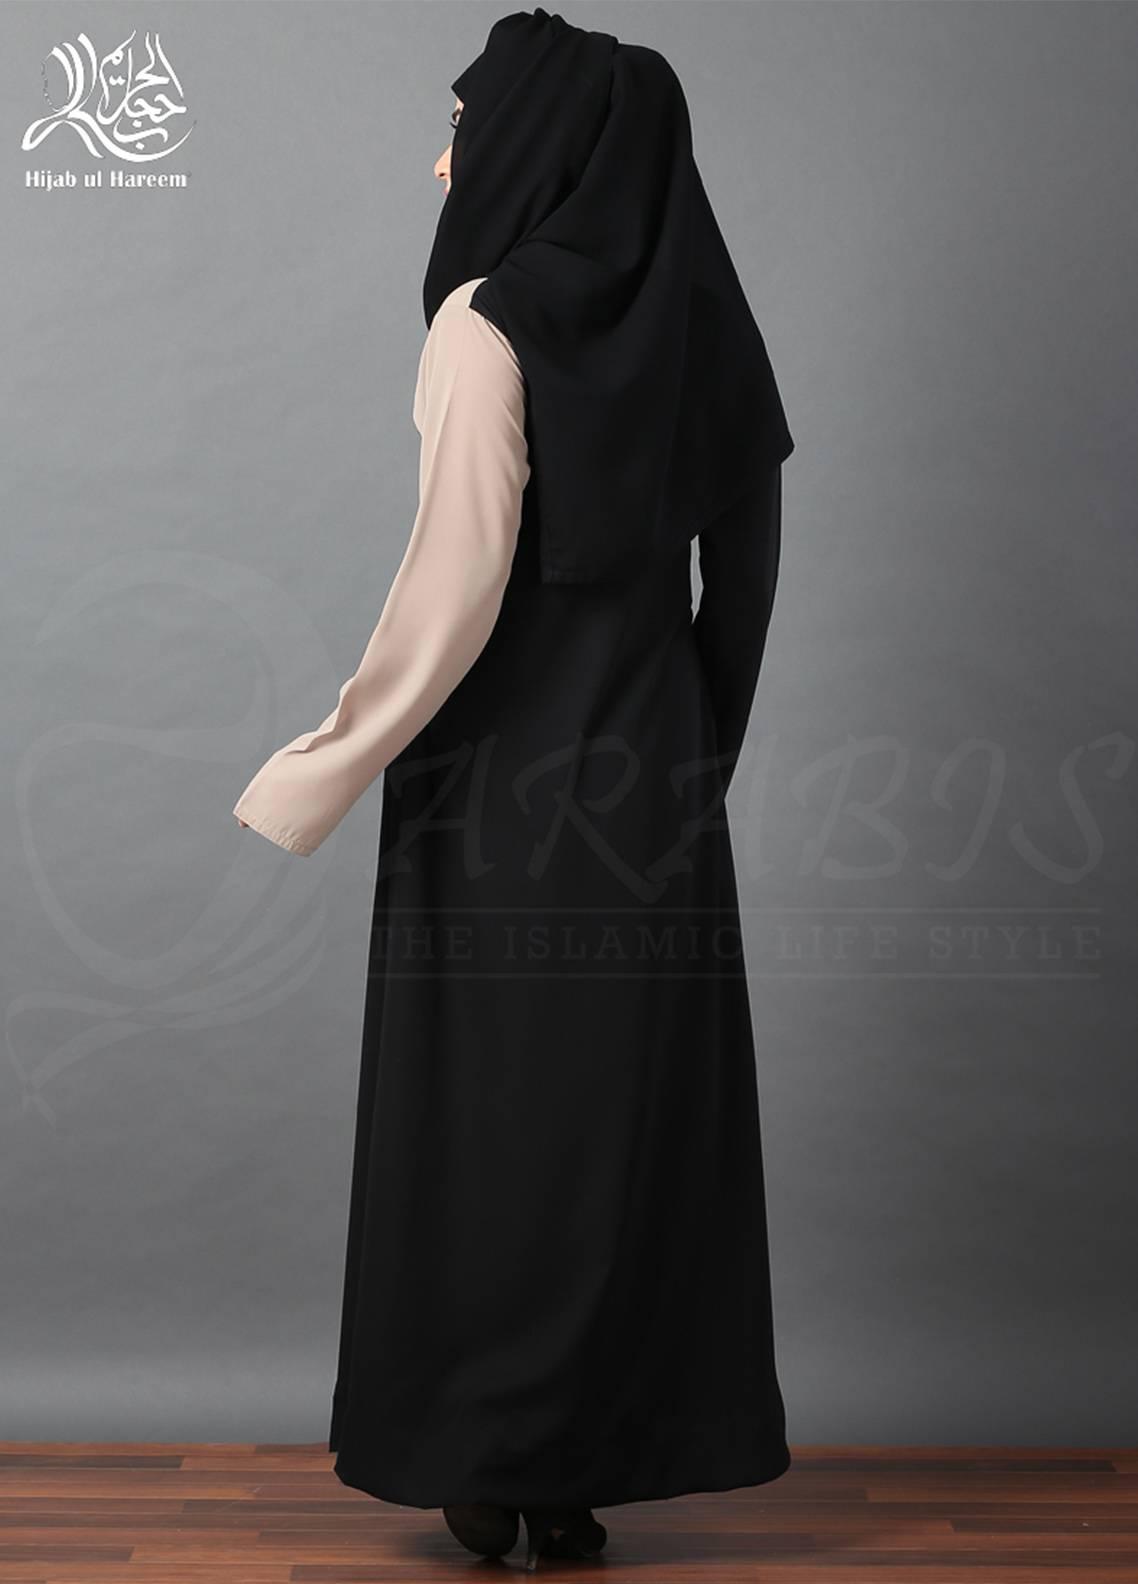 Hijab ul Hareem Pullover  Stitched Abaya 0120-R-A335